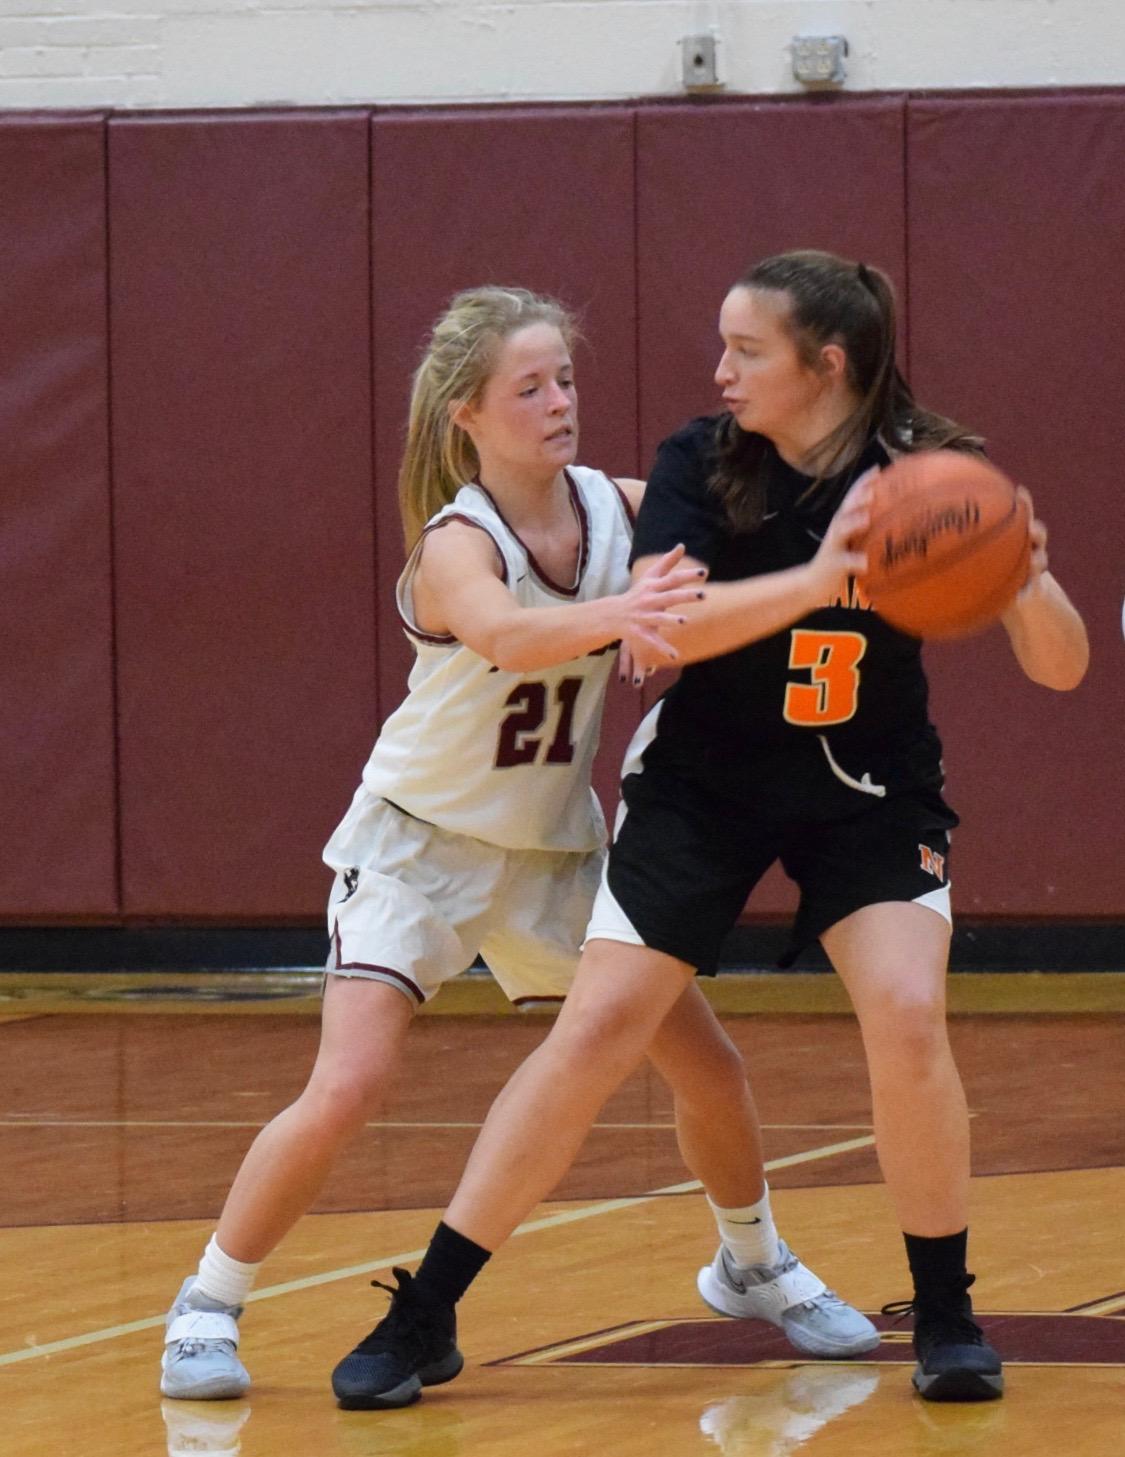 12/12/2020: Girls Varsity Basketball at Rocky River (Photo Credits: Dwayne Kessie)